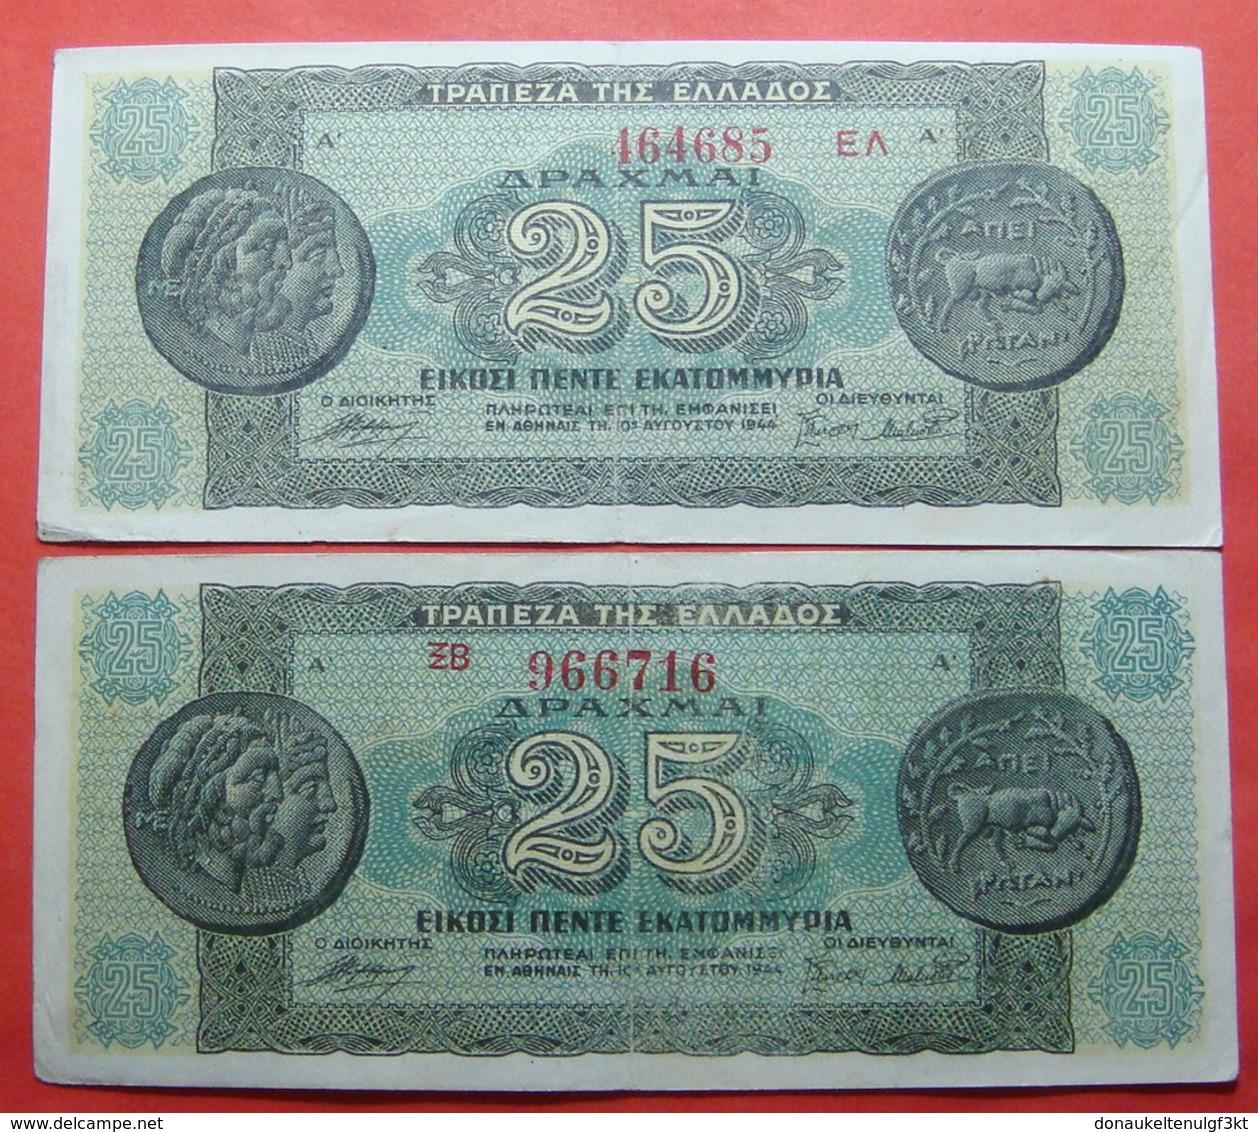 GREECE LOT 2 X BANKNOTES 25 DRACHMAI 1944 - Grèce